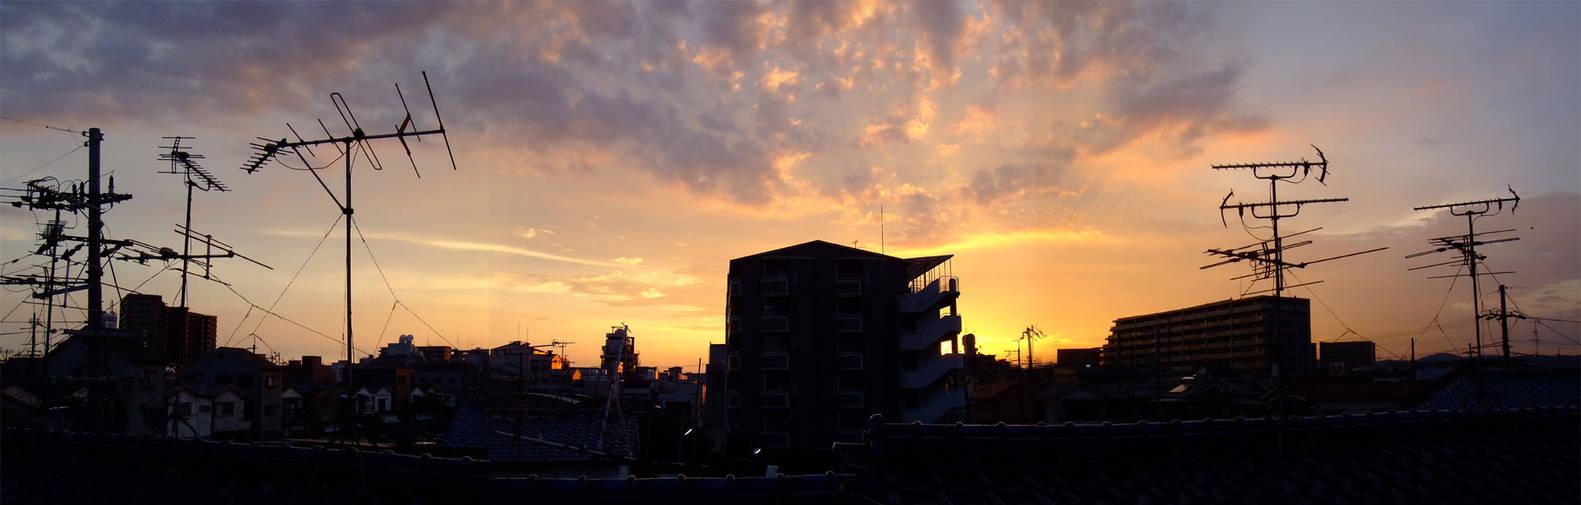 Sunset Panorama in Japan